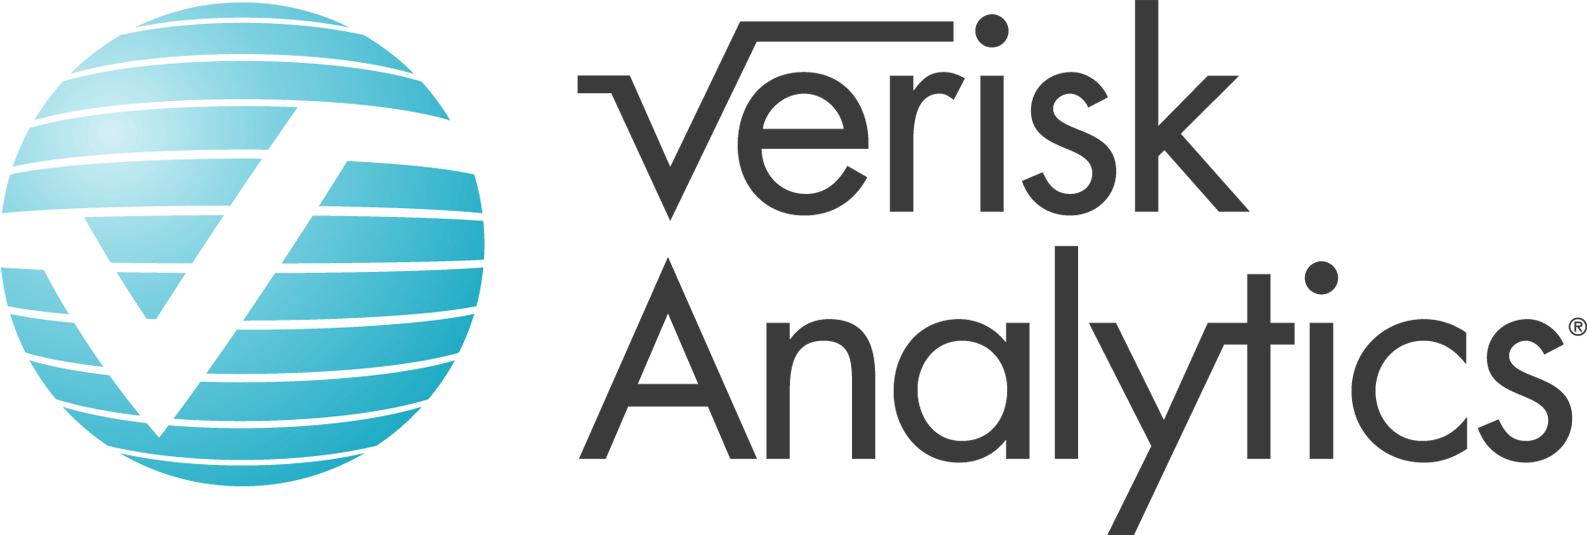 Verisk Analytics: Repurposing Data to Deliver Unique Customer ...